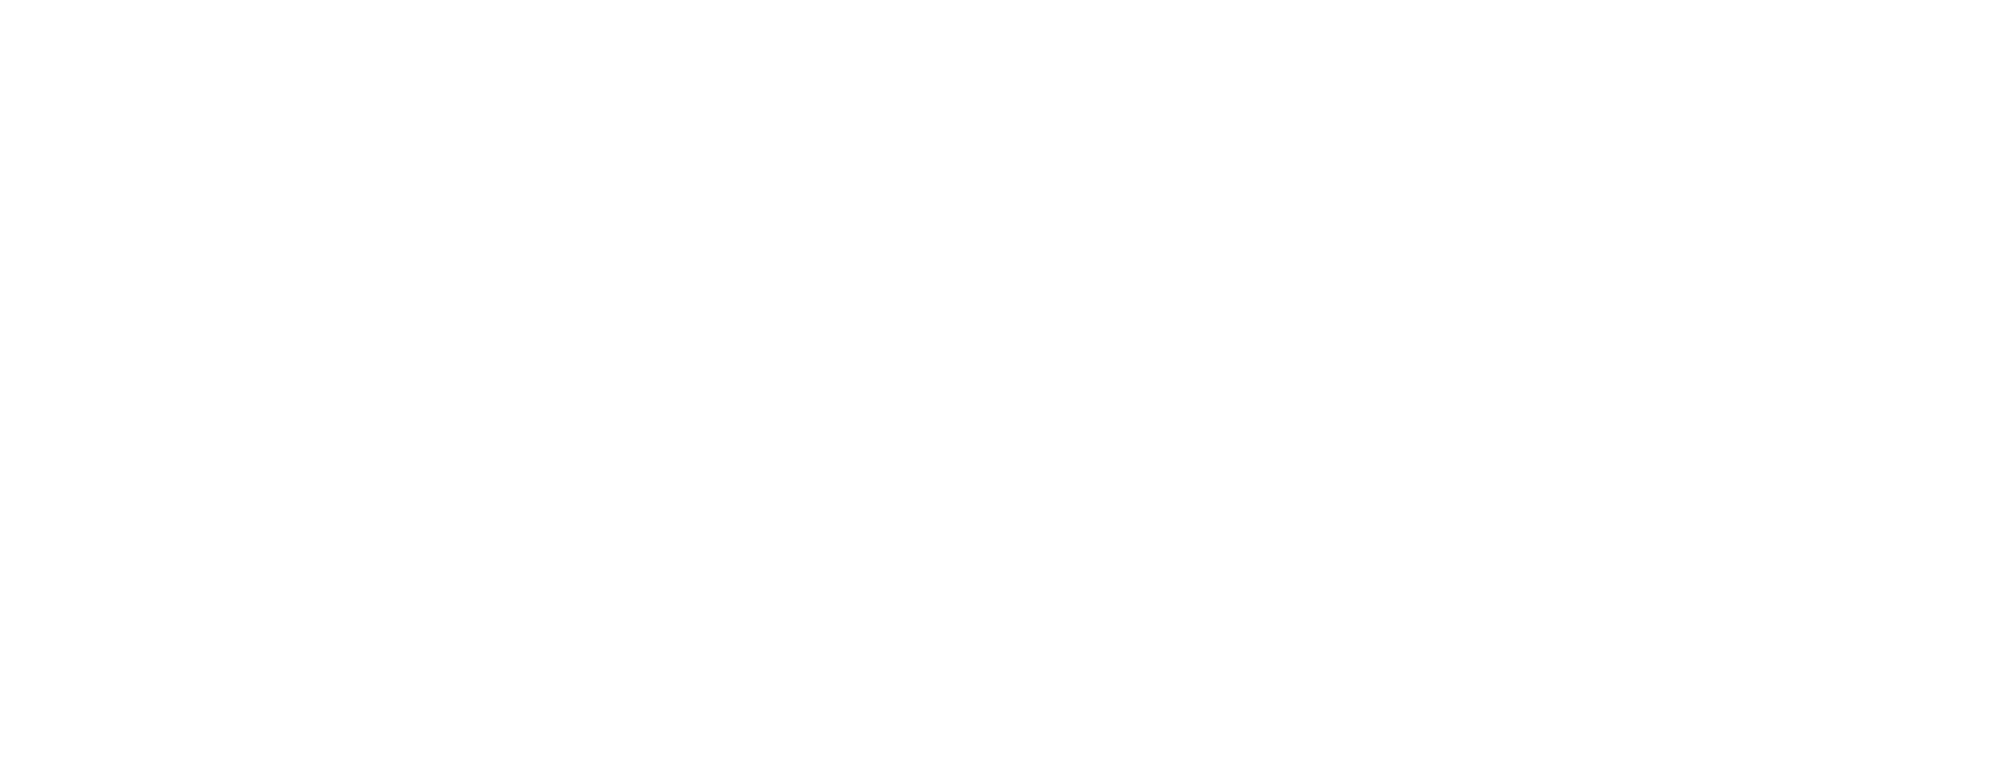 Platzi